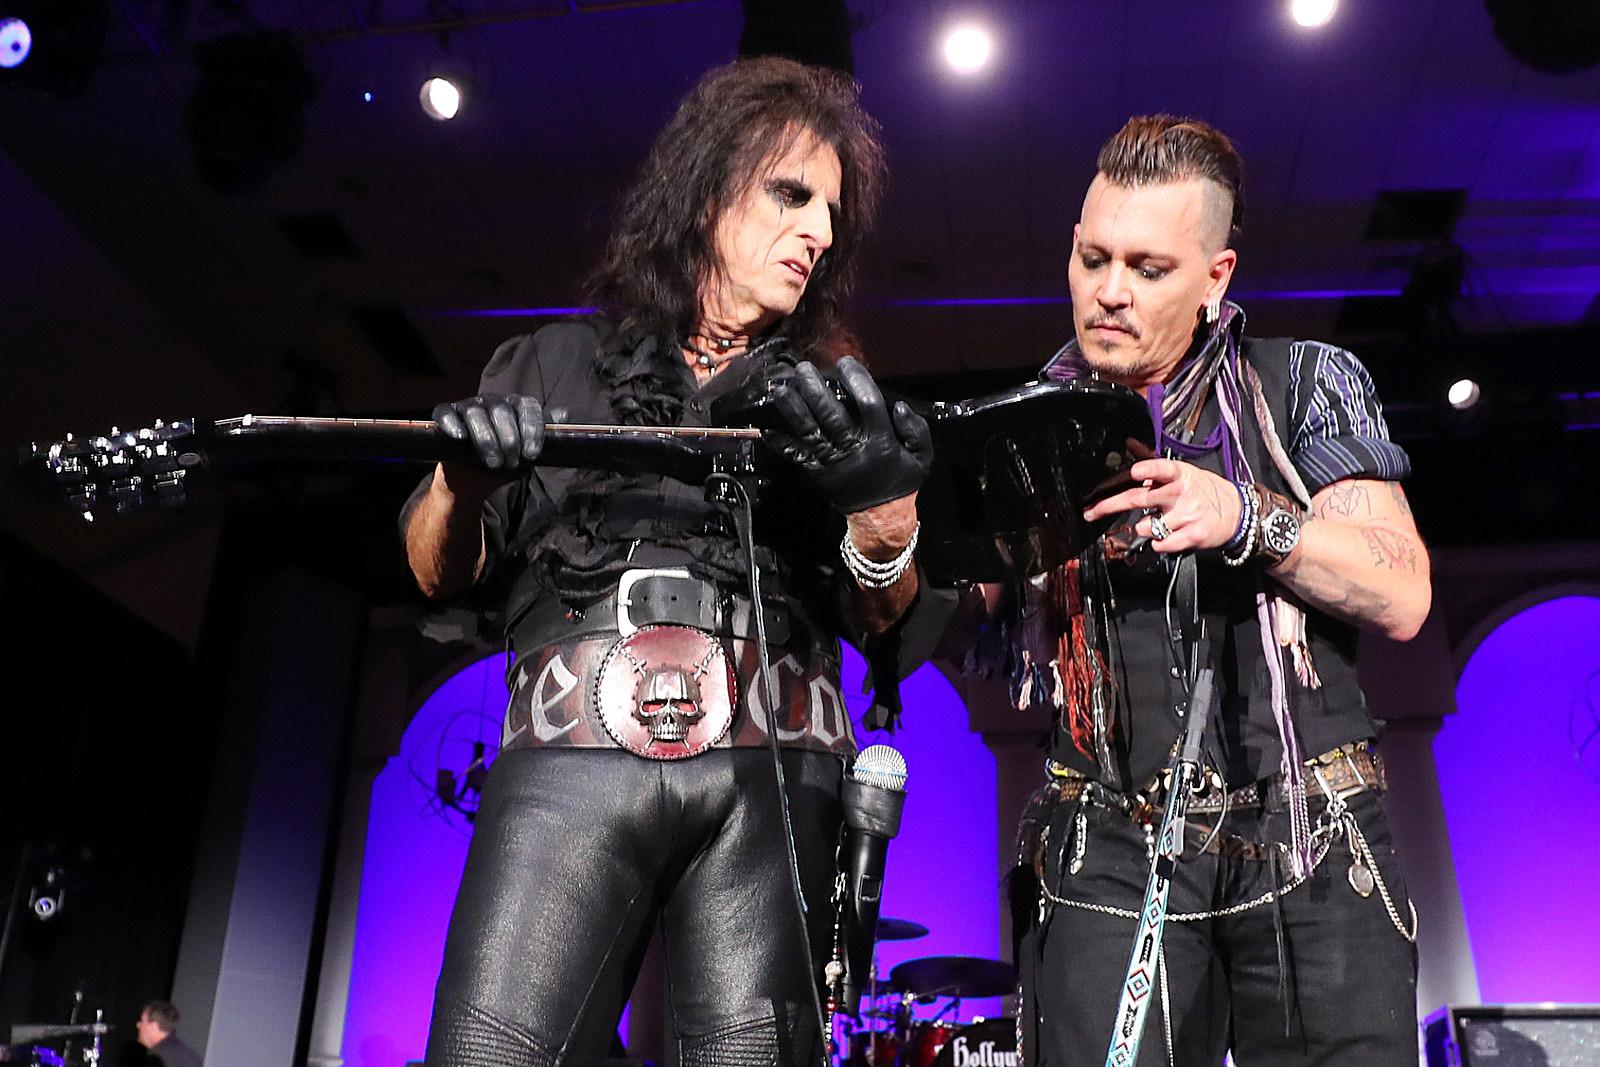 Hollywood Vampires Kick Off 2018 Tour – Set List, Videos